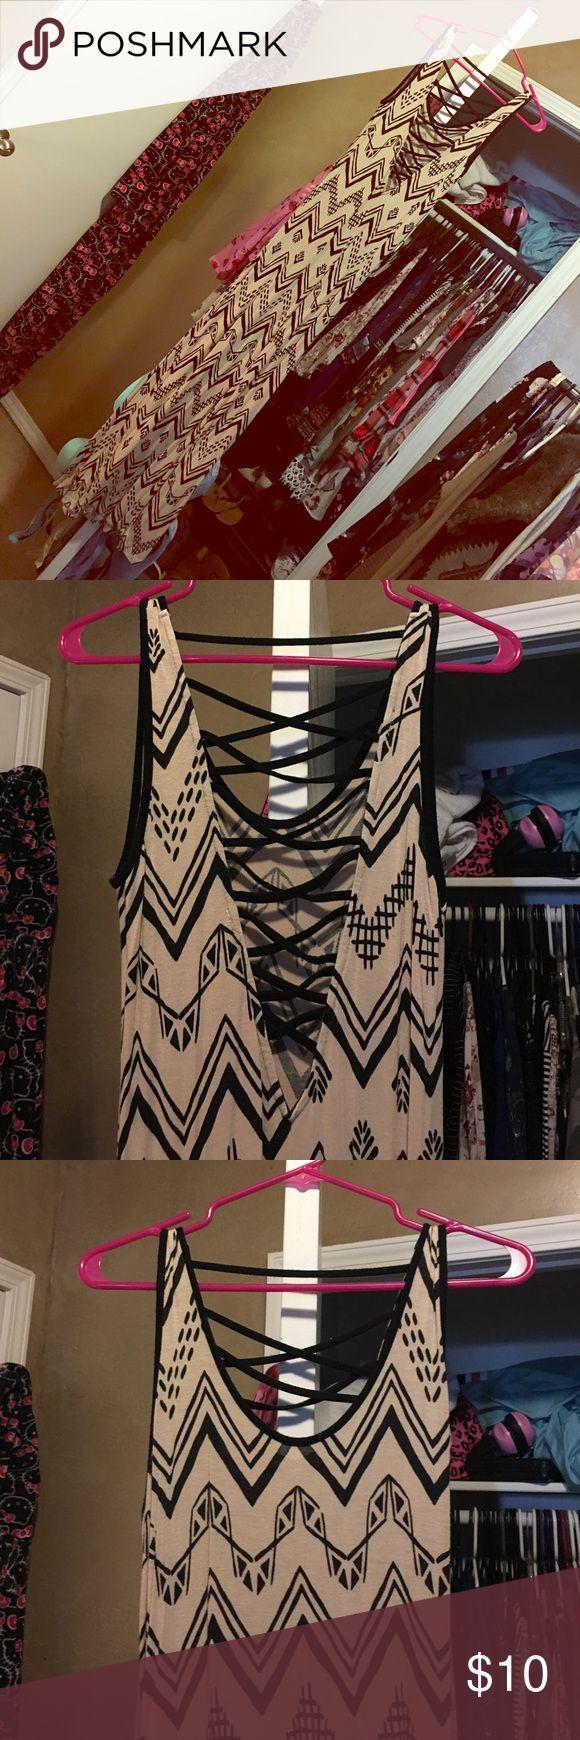 Tribal maxi dress Tribal maxi dress with scoopneck and crisscross deep v in the back Dresses Maxi